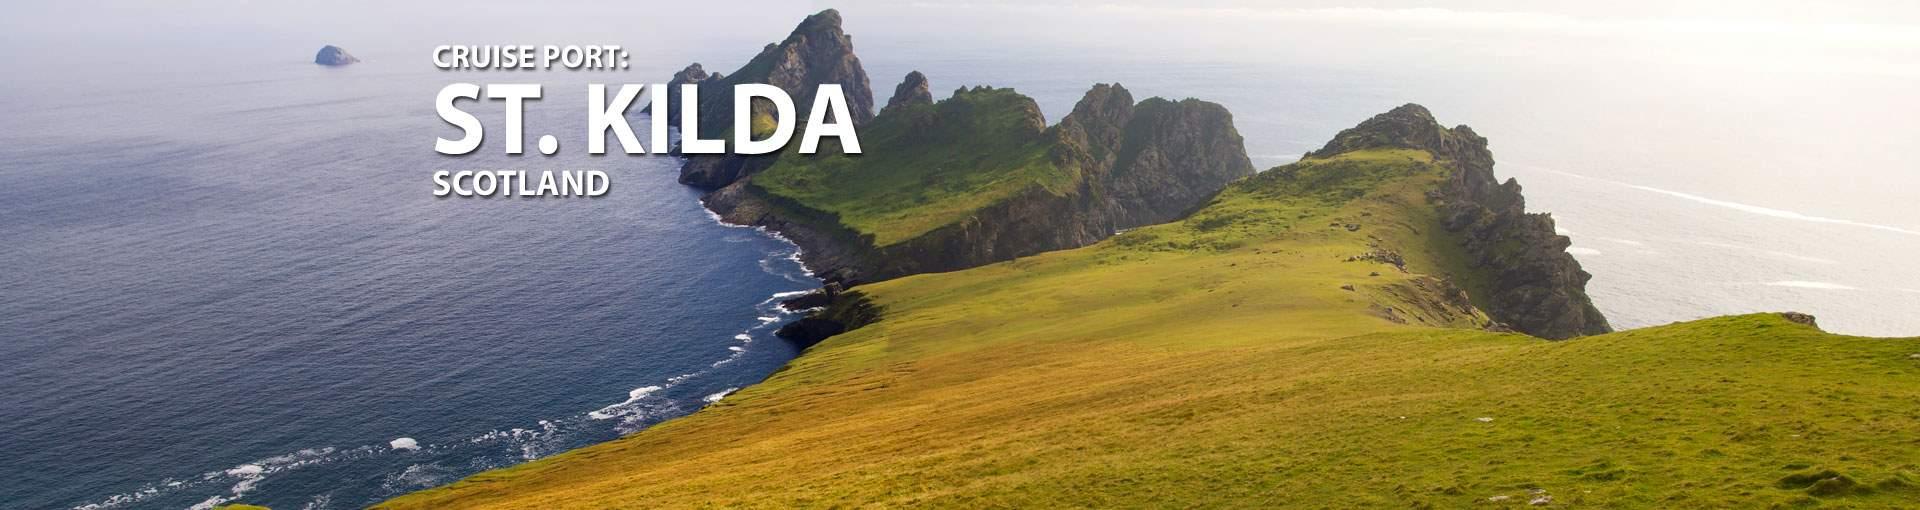 Cruises to St. Kilda, Scotland